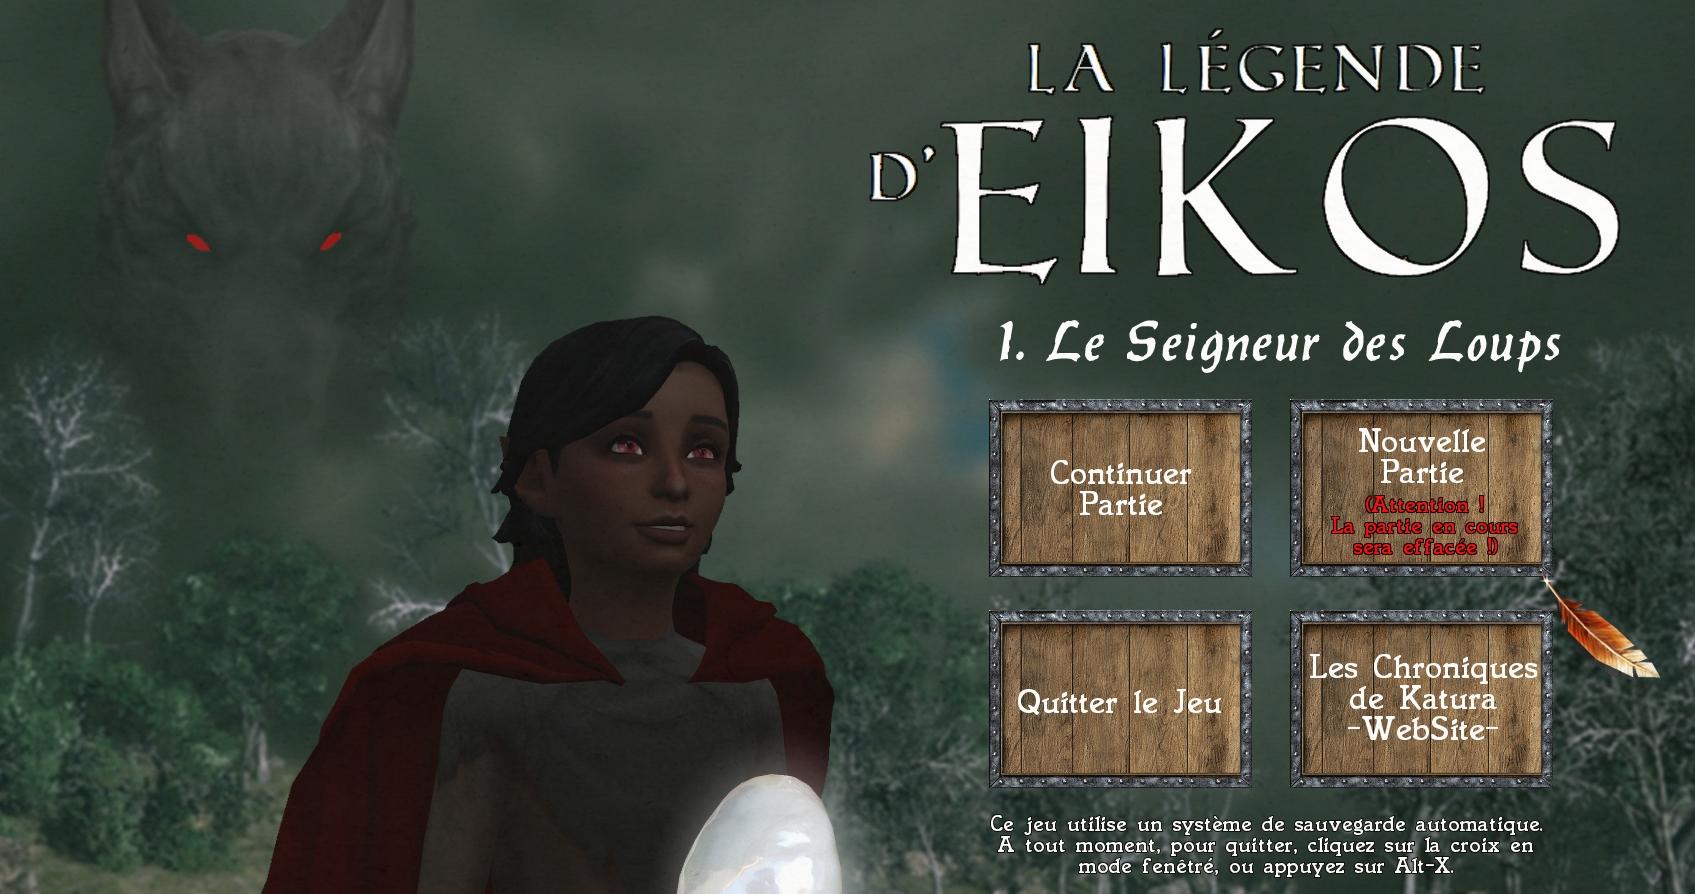 Screenshot 1 of La Légende d'Eikos